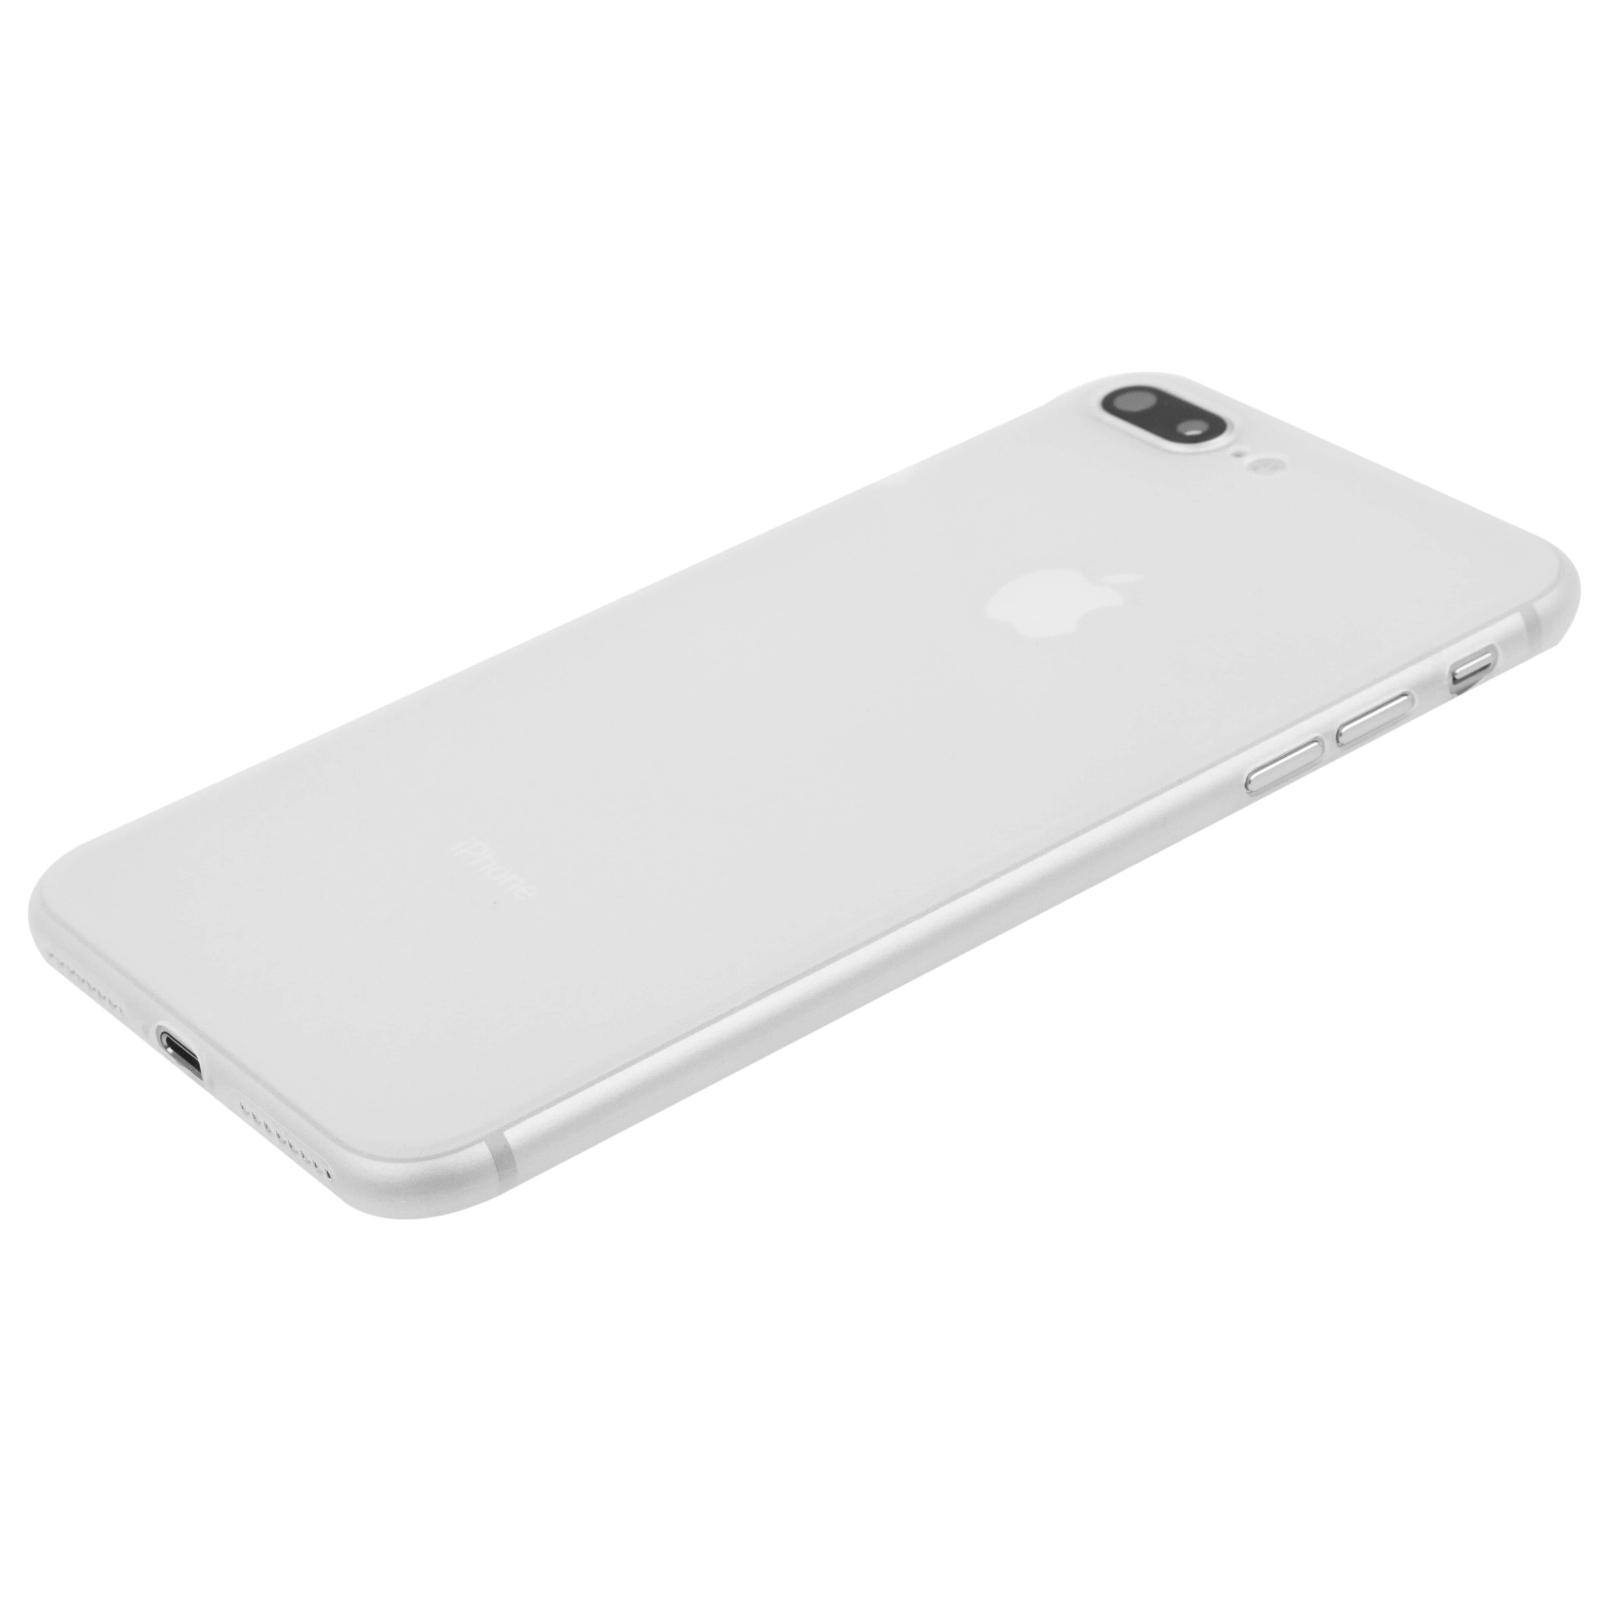 Чехол для моб. телефона MakeFuture PP/Ice Case для Apple iPhone 8 Plus White (MCI-AI8PW) изображение 3